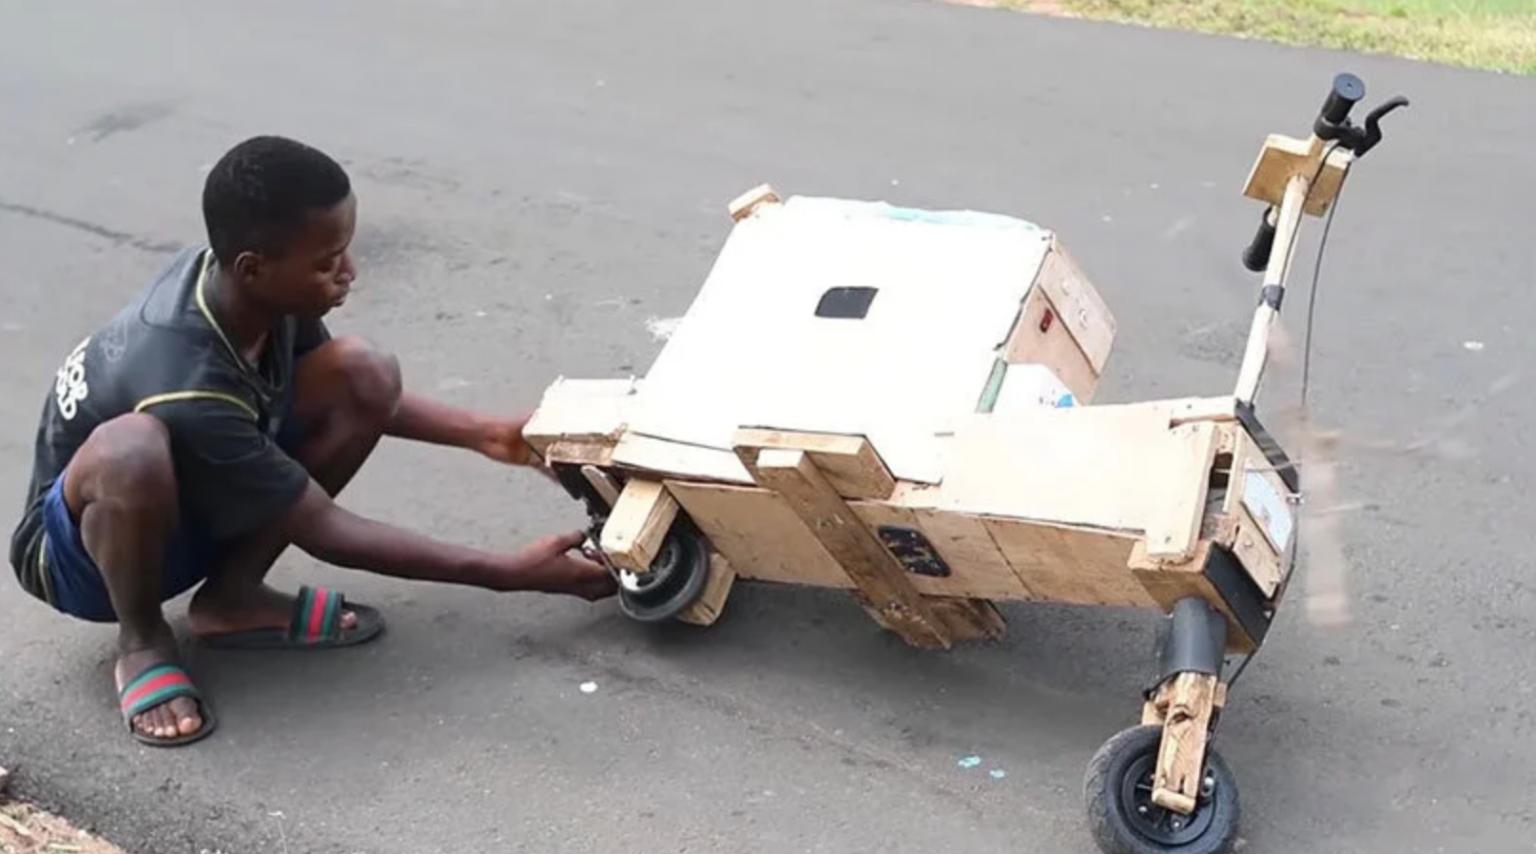 adolescente constrói moto elétrica madeira movida energia solar